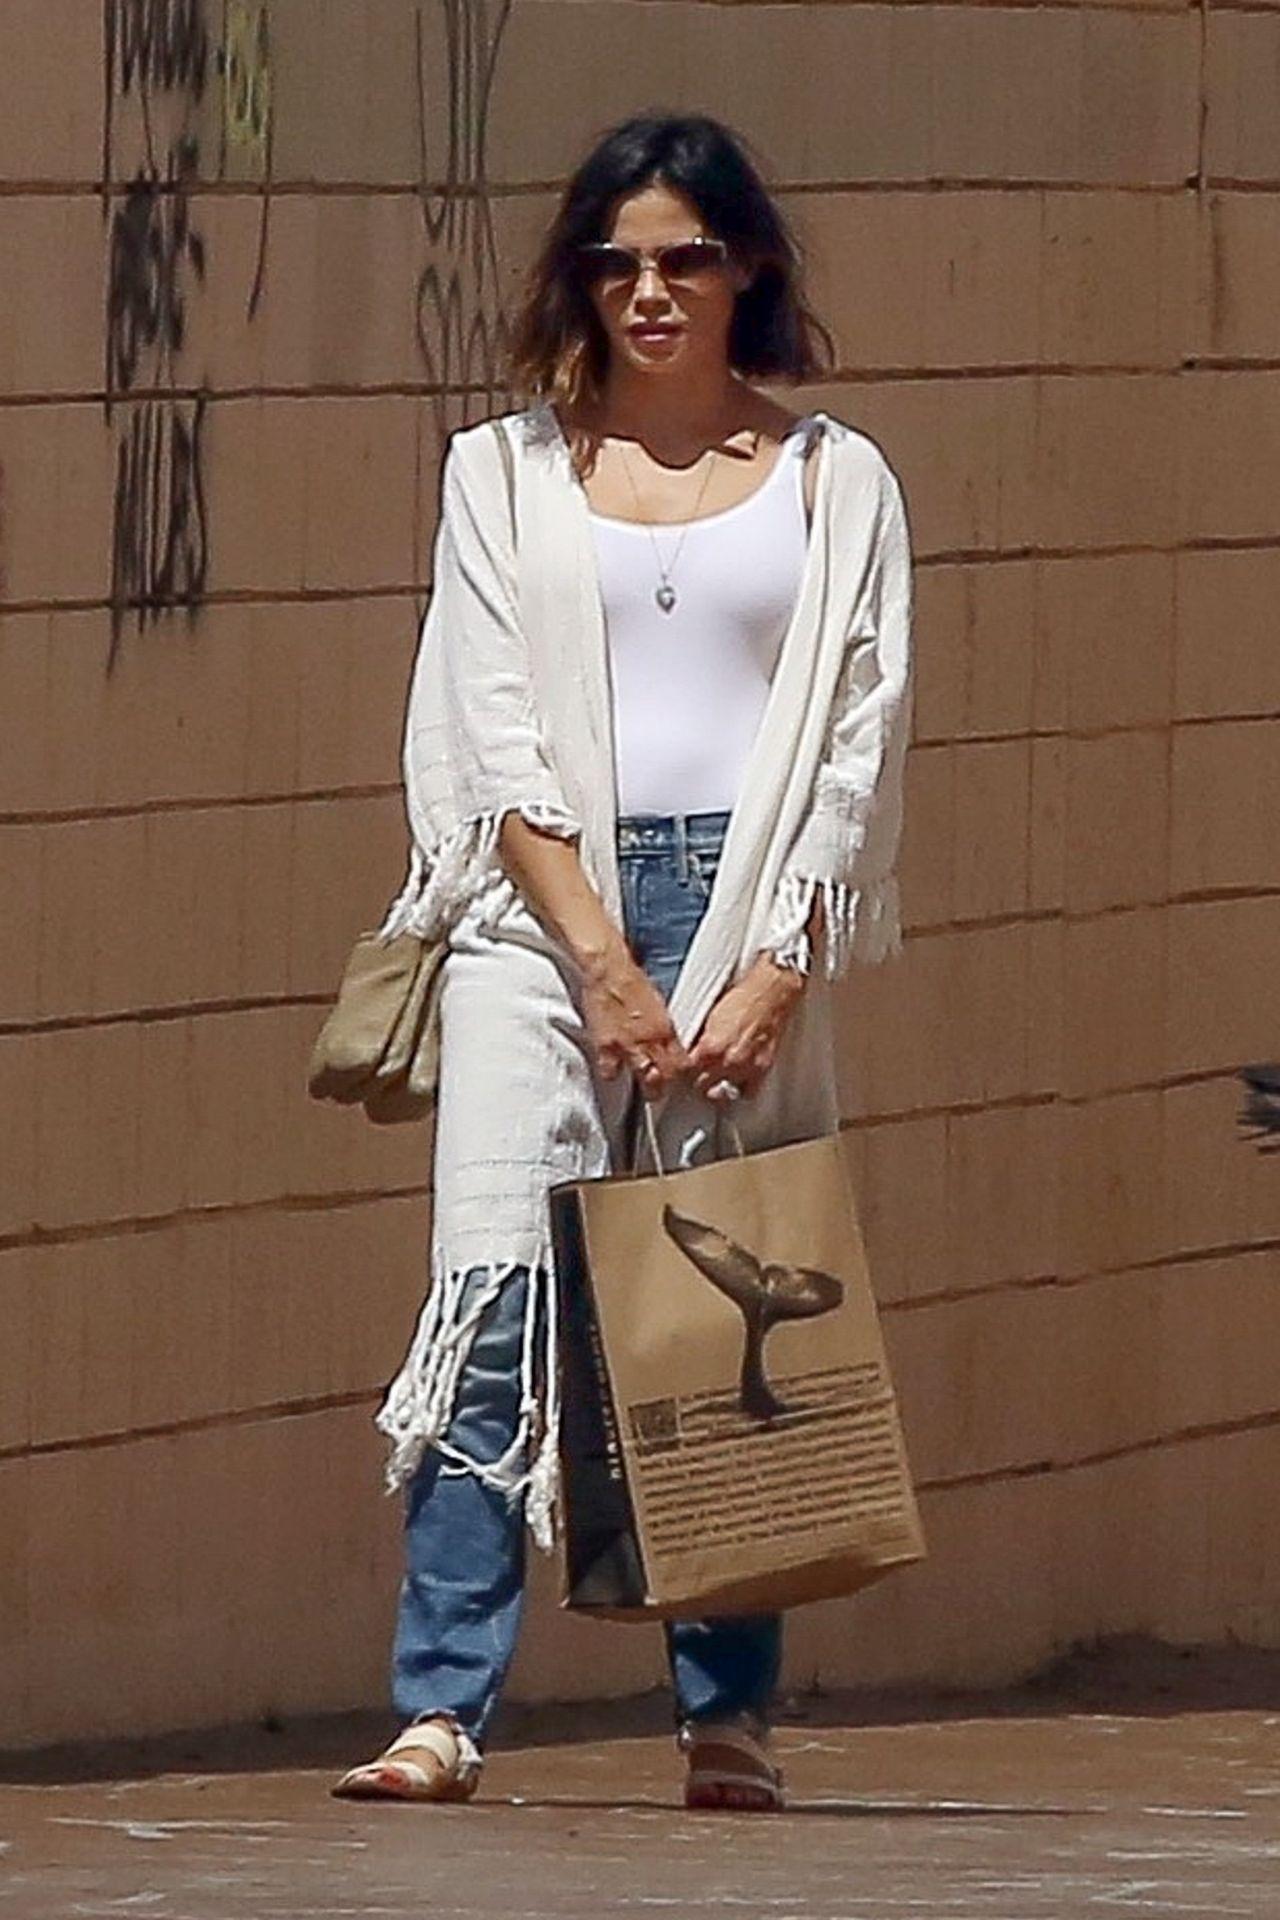 Jenna Dewan Tatum - Enjoys a Day in Studio City, CA 09/11/2017